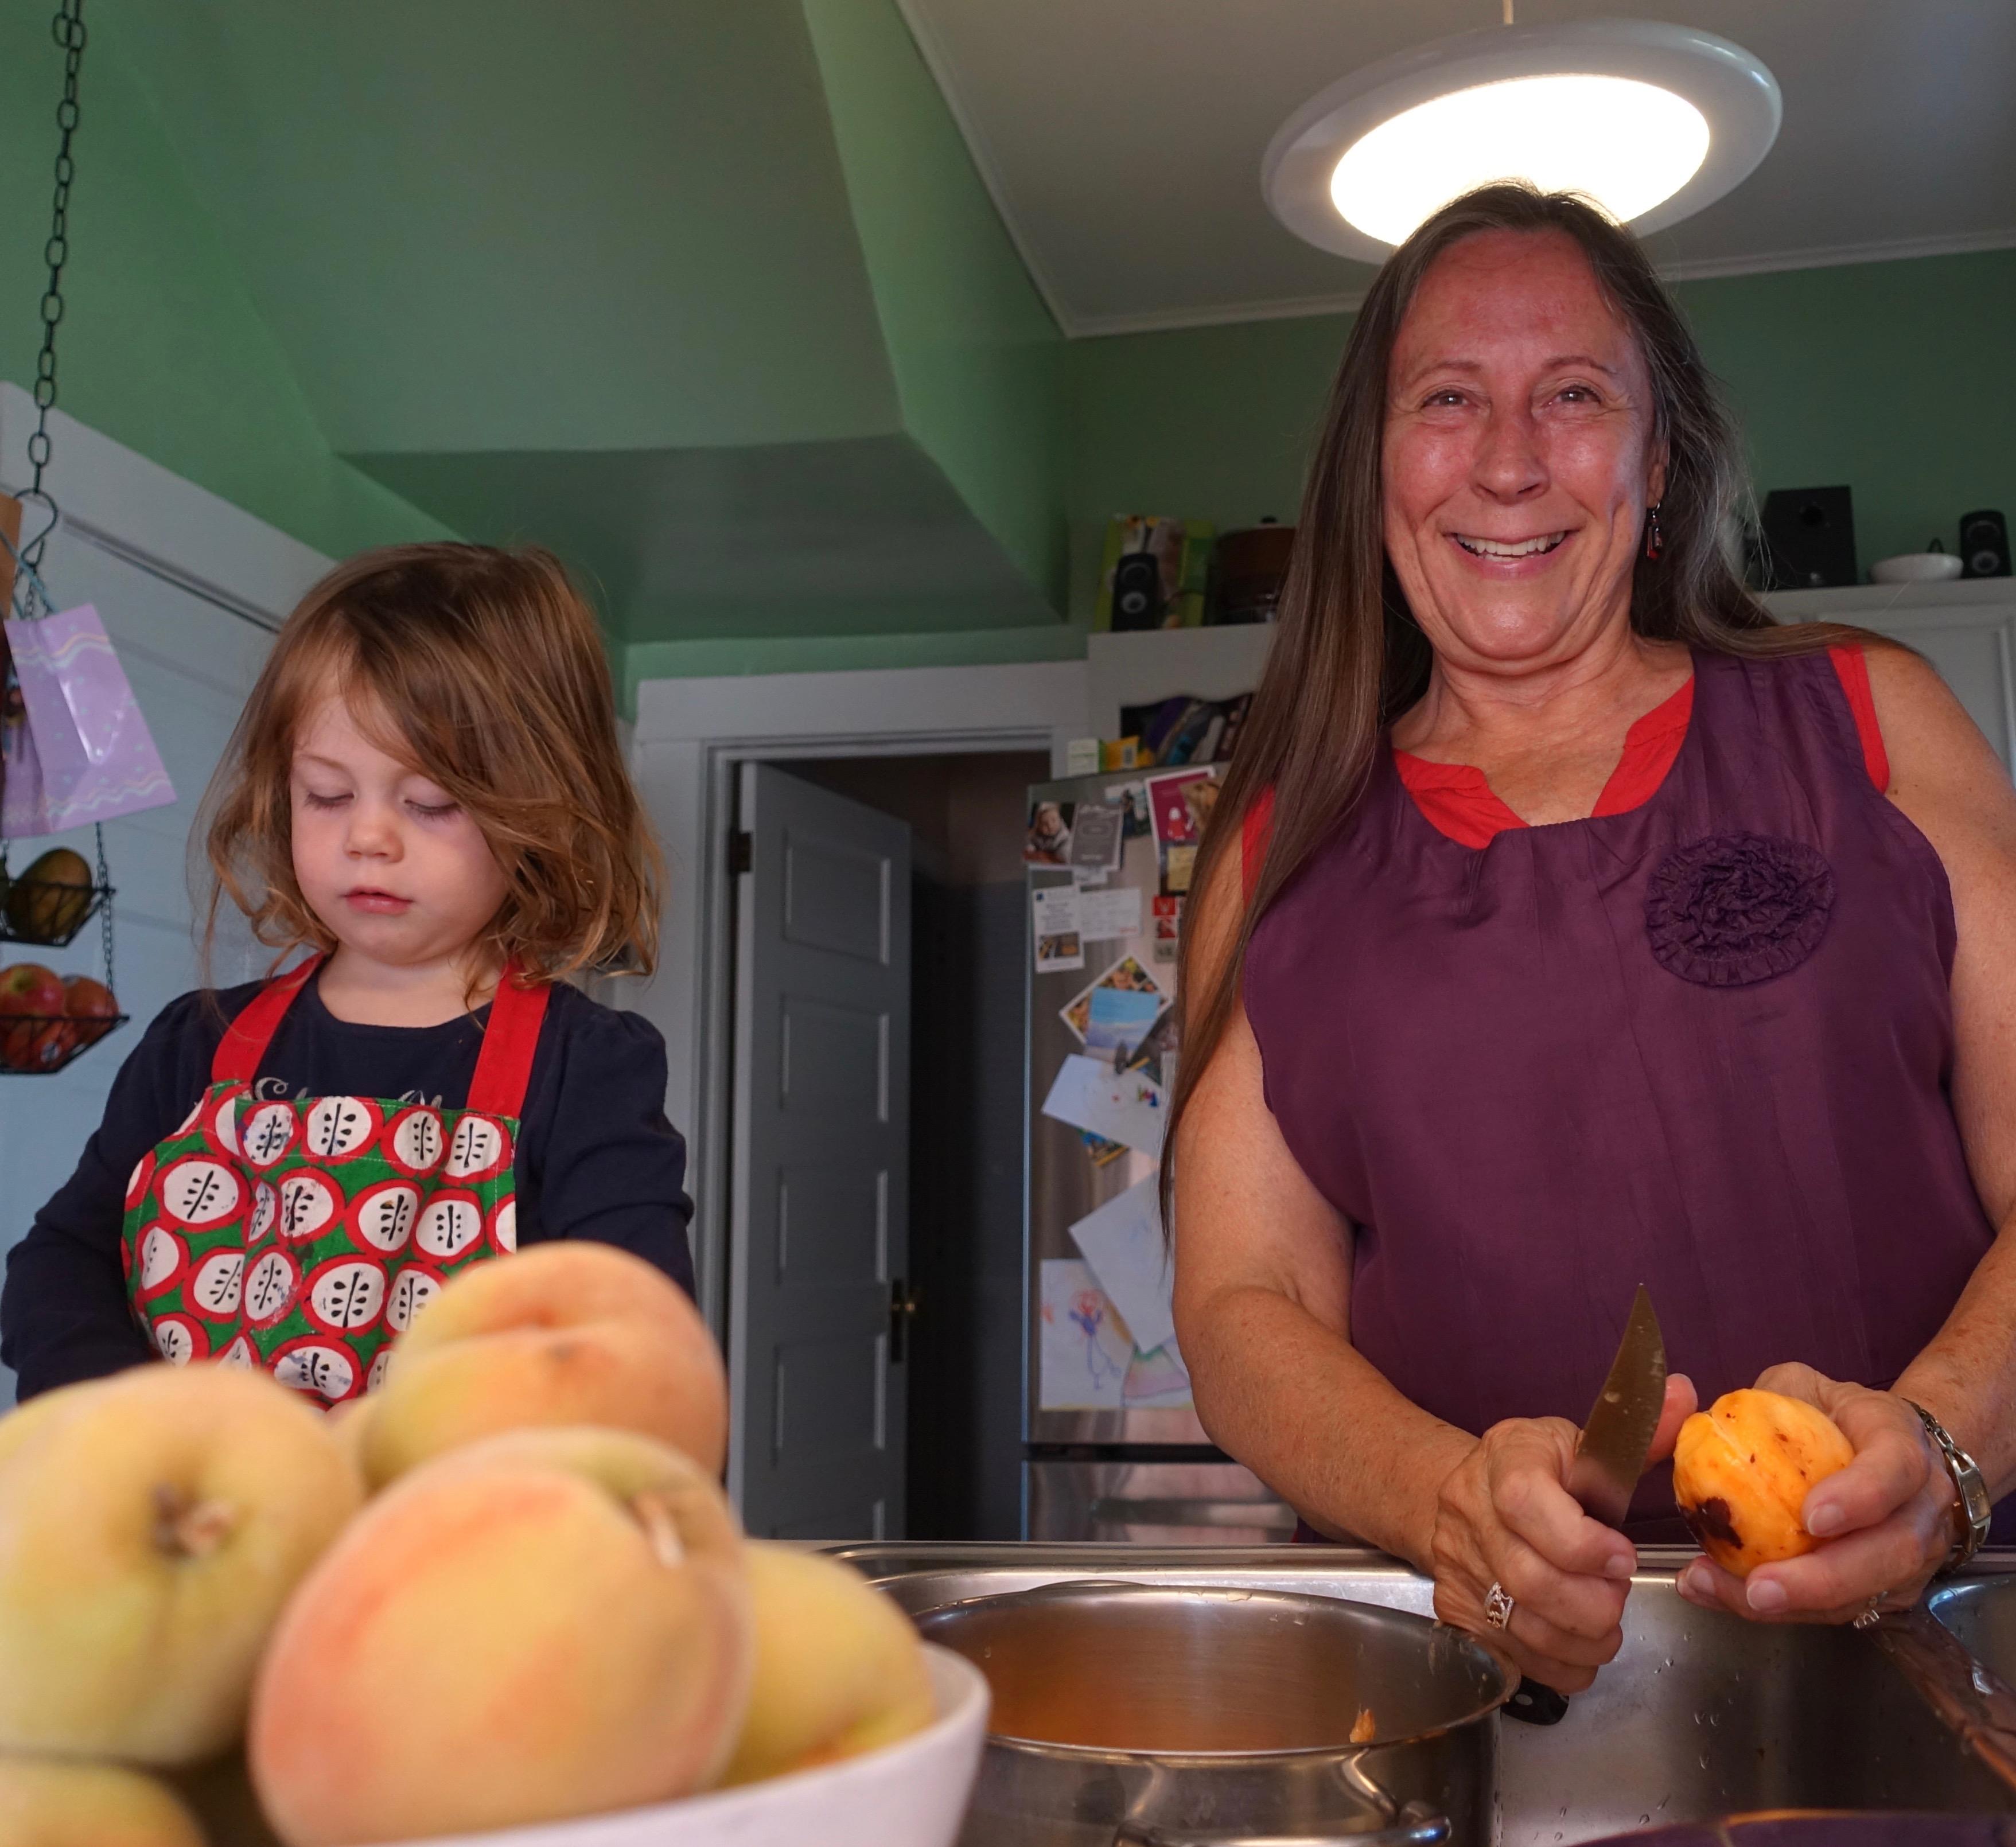 Making pies with Grandma